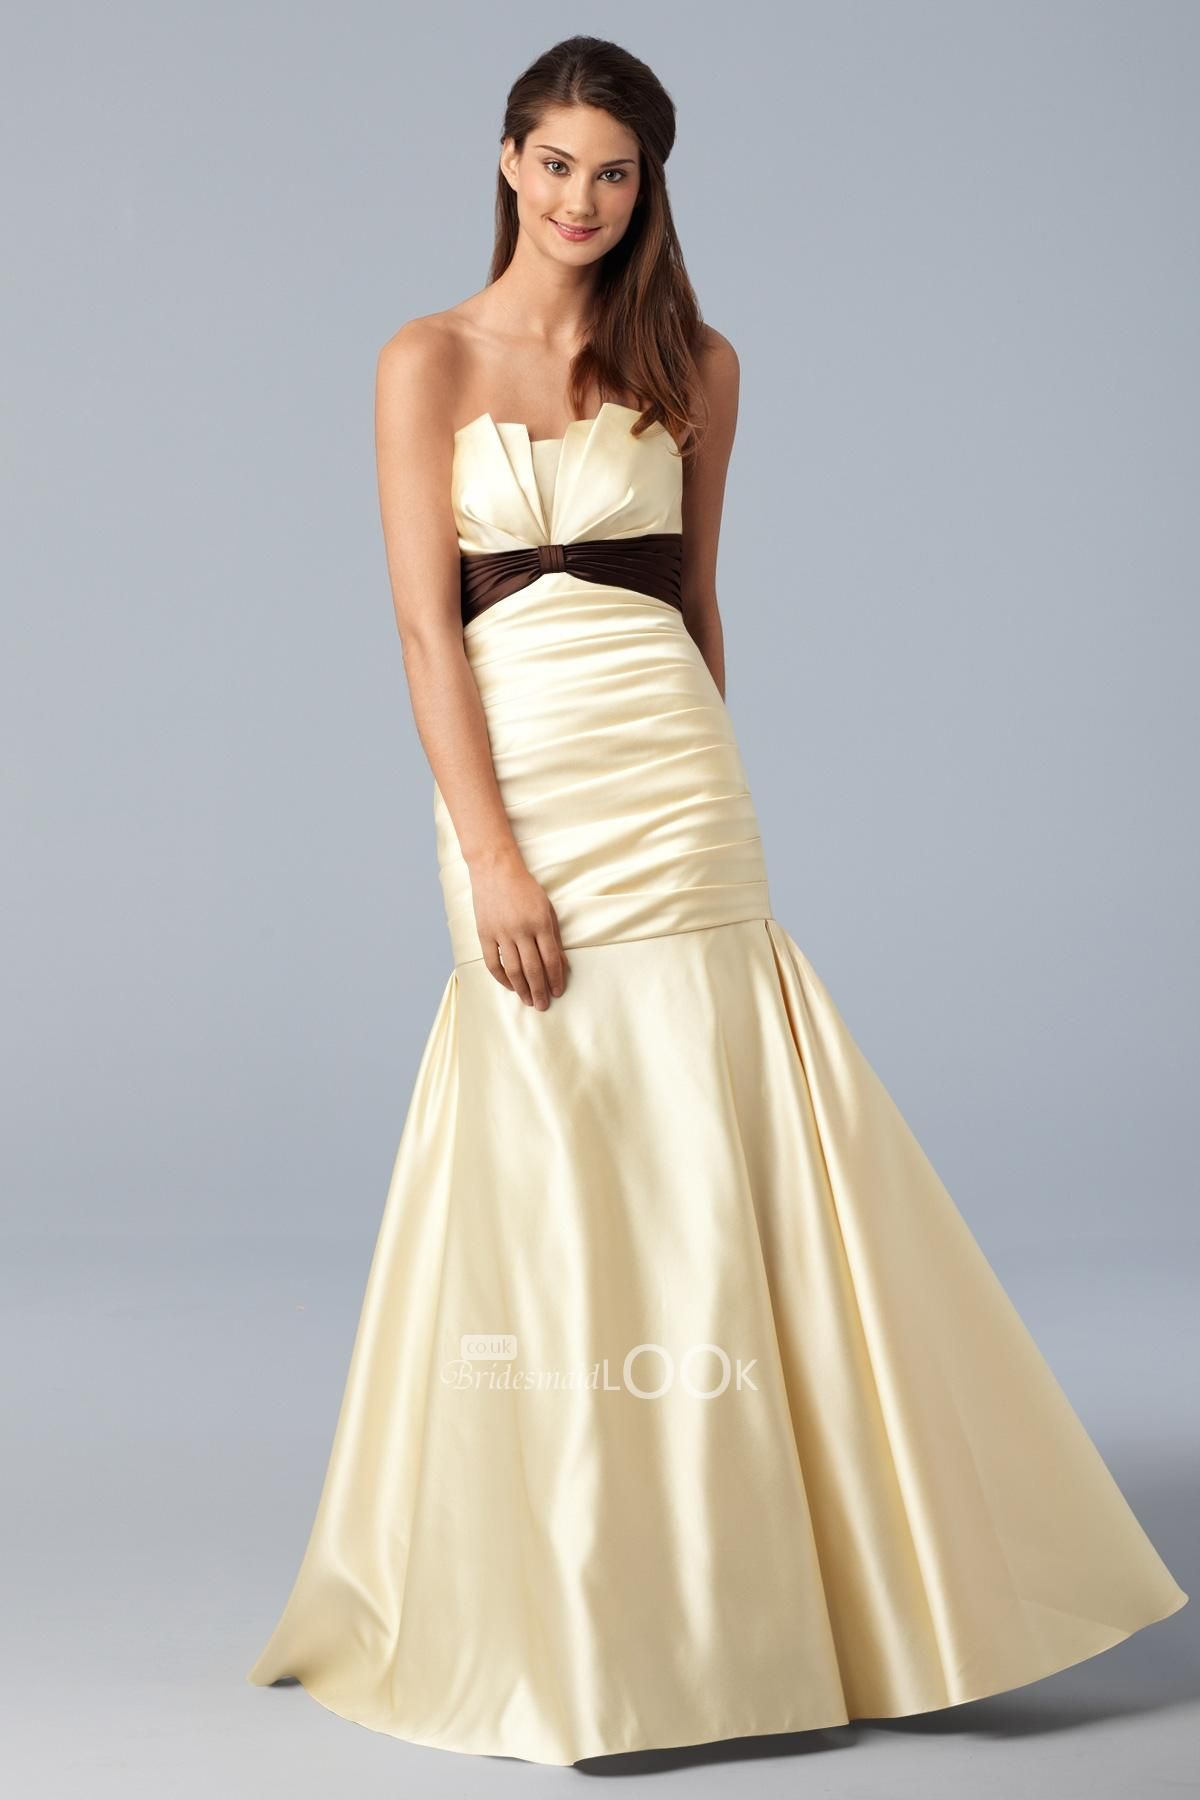 Wedding dresses lemon bridesmaid dresses style pinterest wedding dresses lemon bridesmaid dresses ombrellifo Choice Image